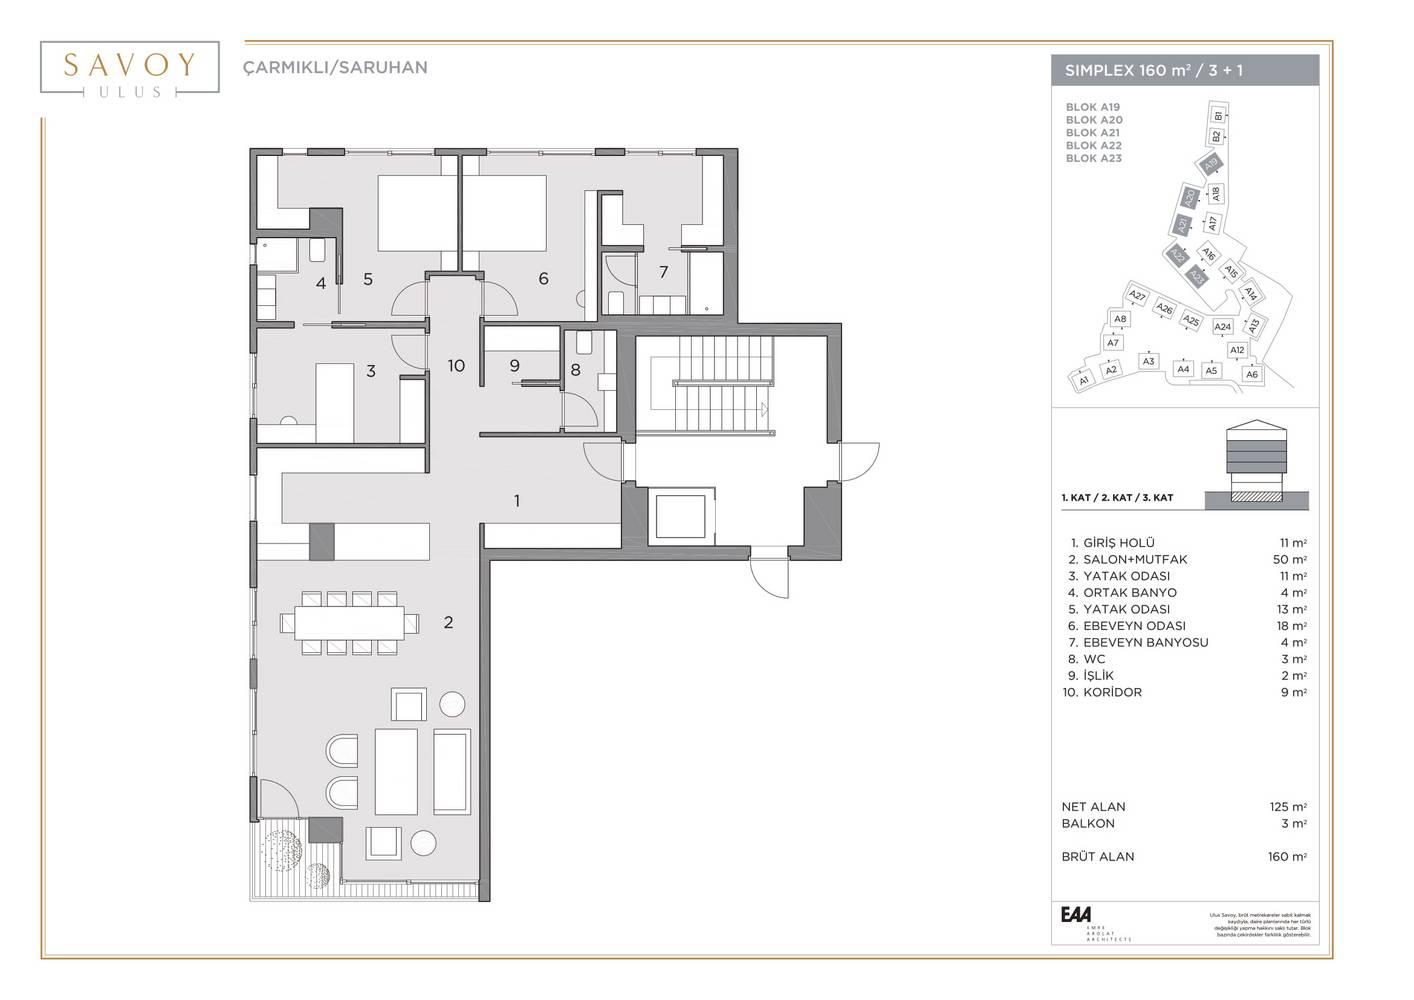 Savoy Residence S160